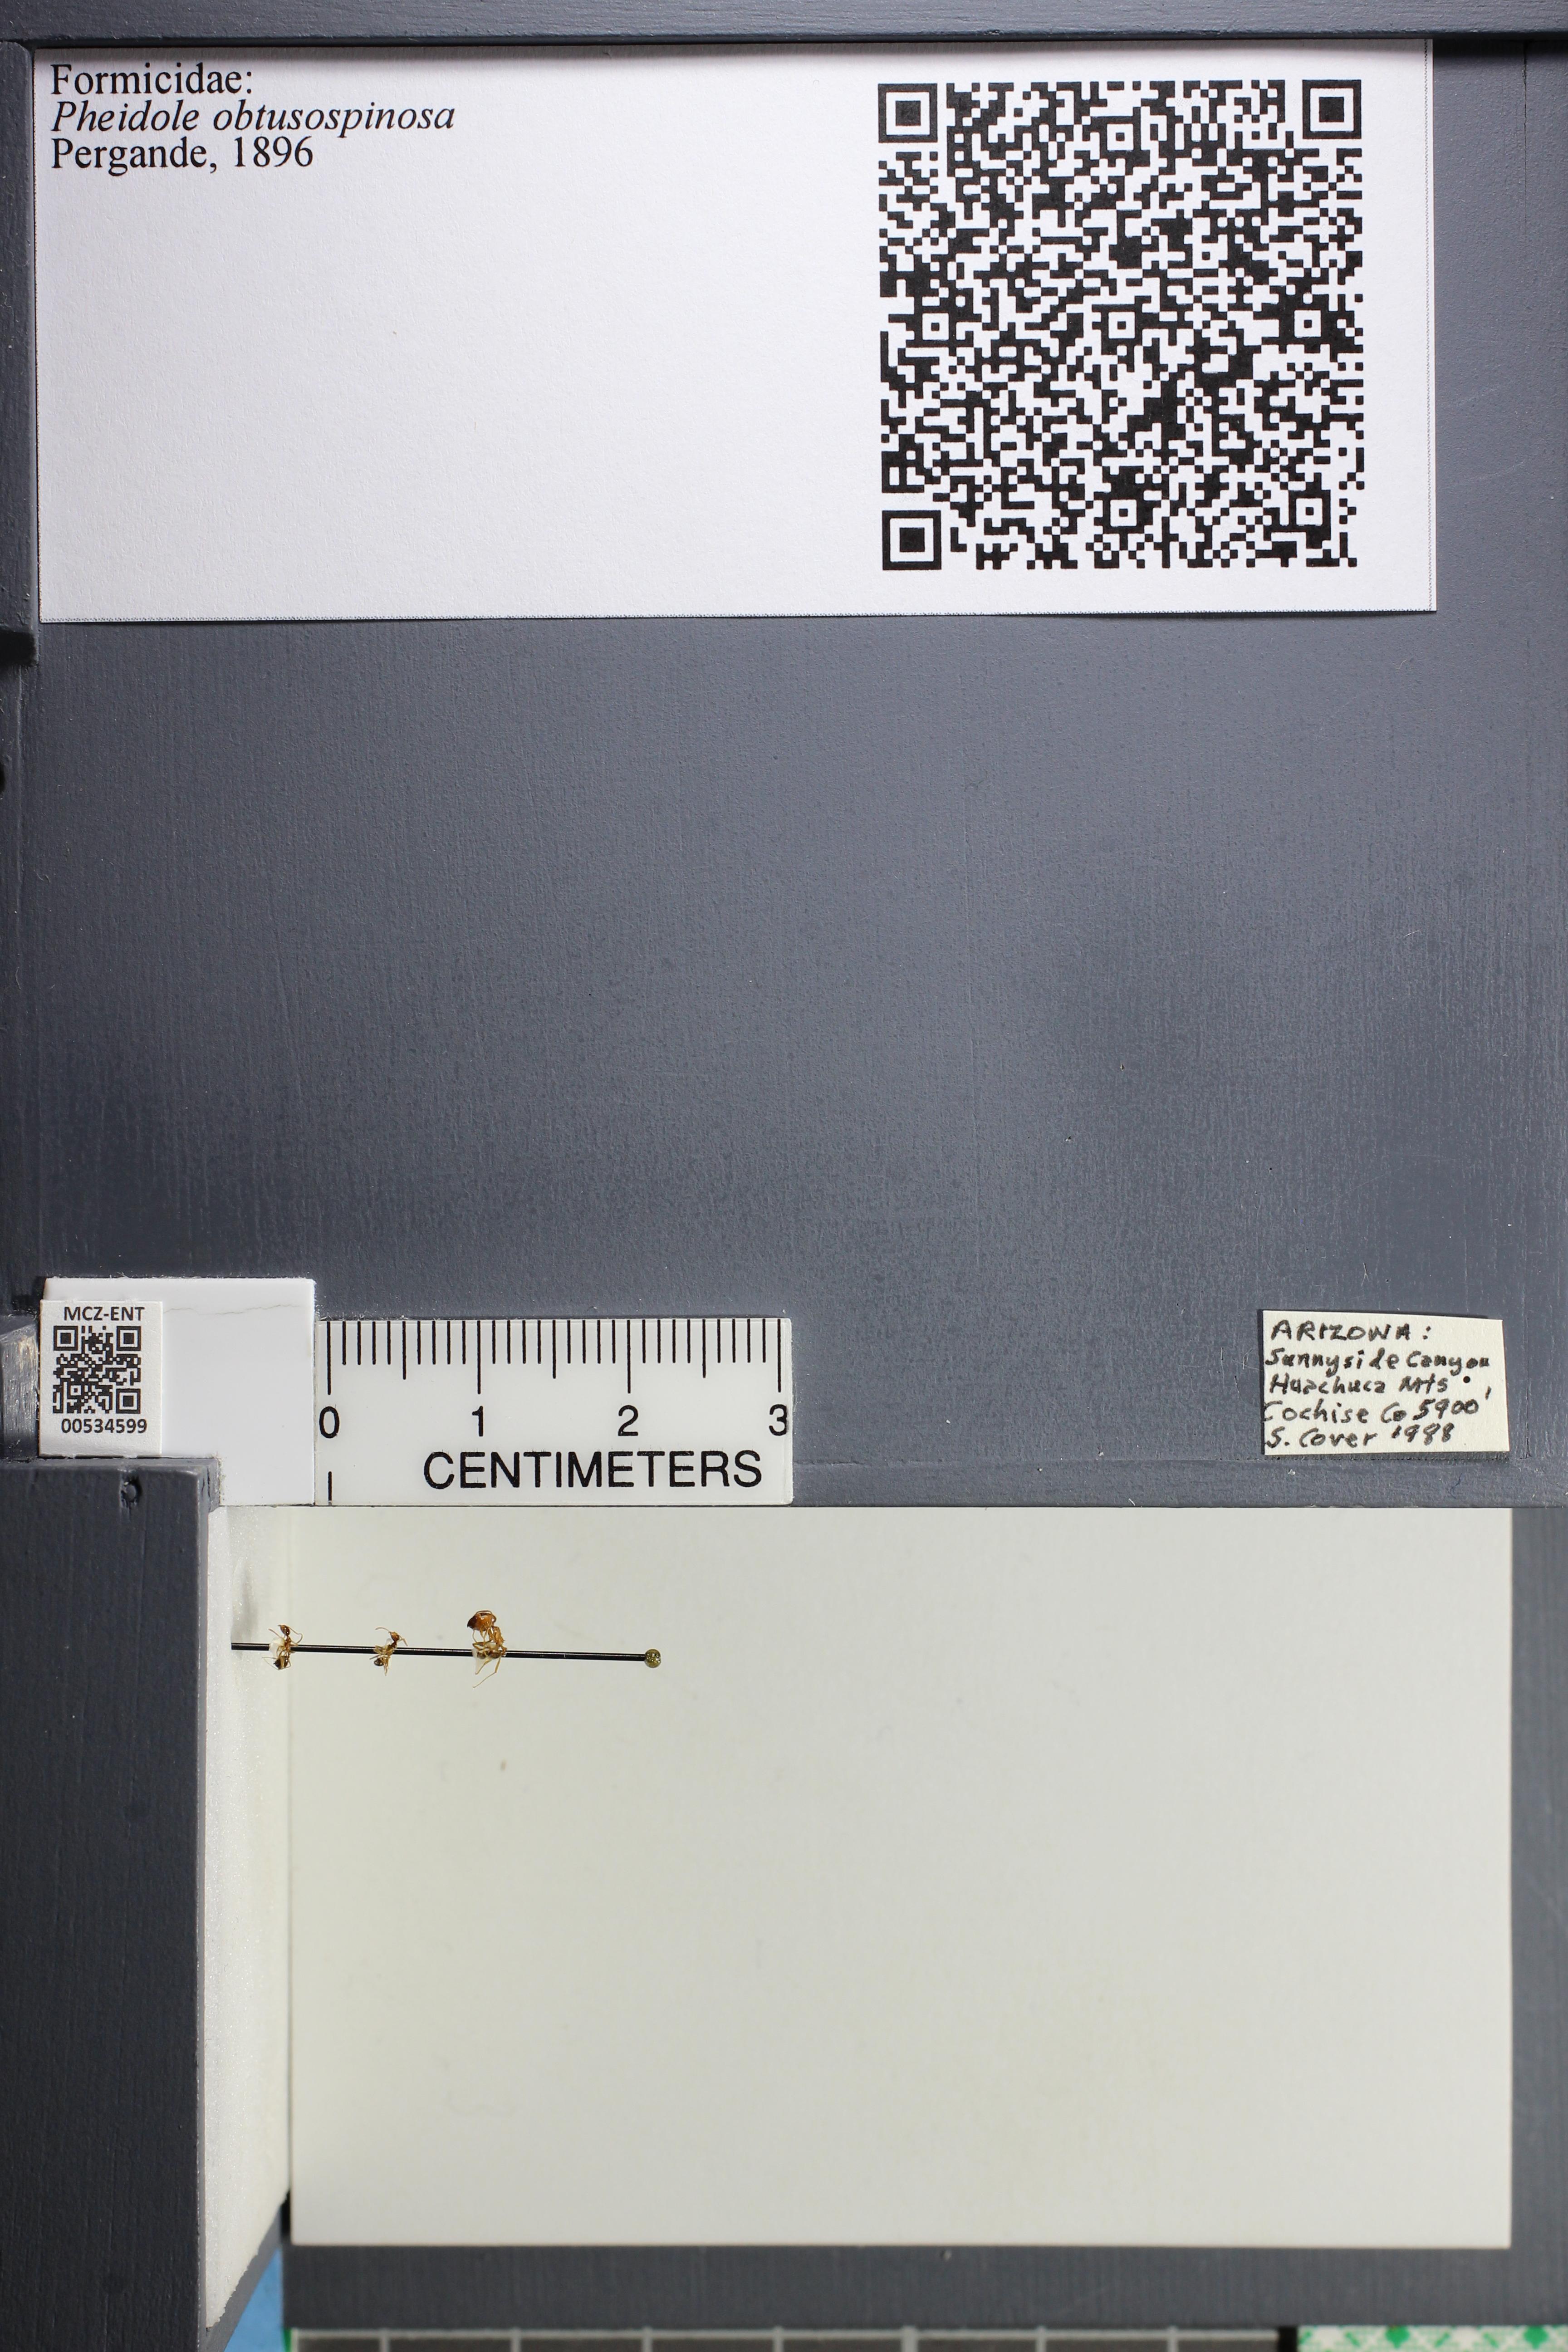 Media of type image, MCZ:Ent:534599 Identified as Pheidole obtusospinosa.